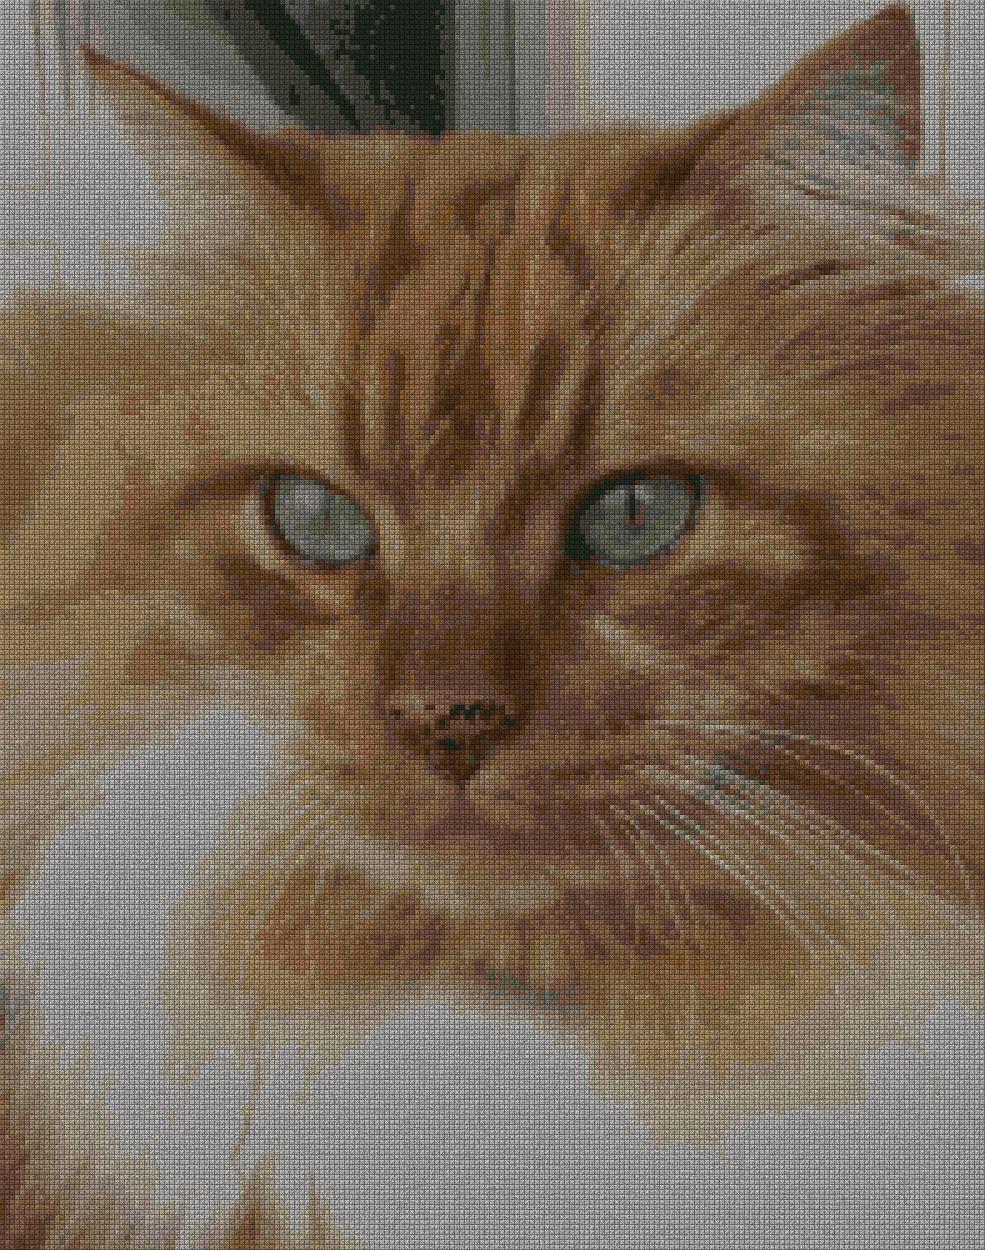 schemi_misti/animali_terra2/gatto_testa-197x250.jpg